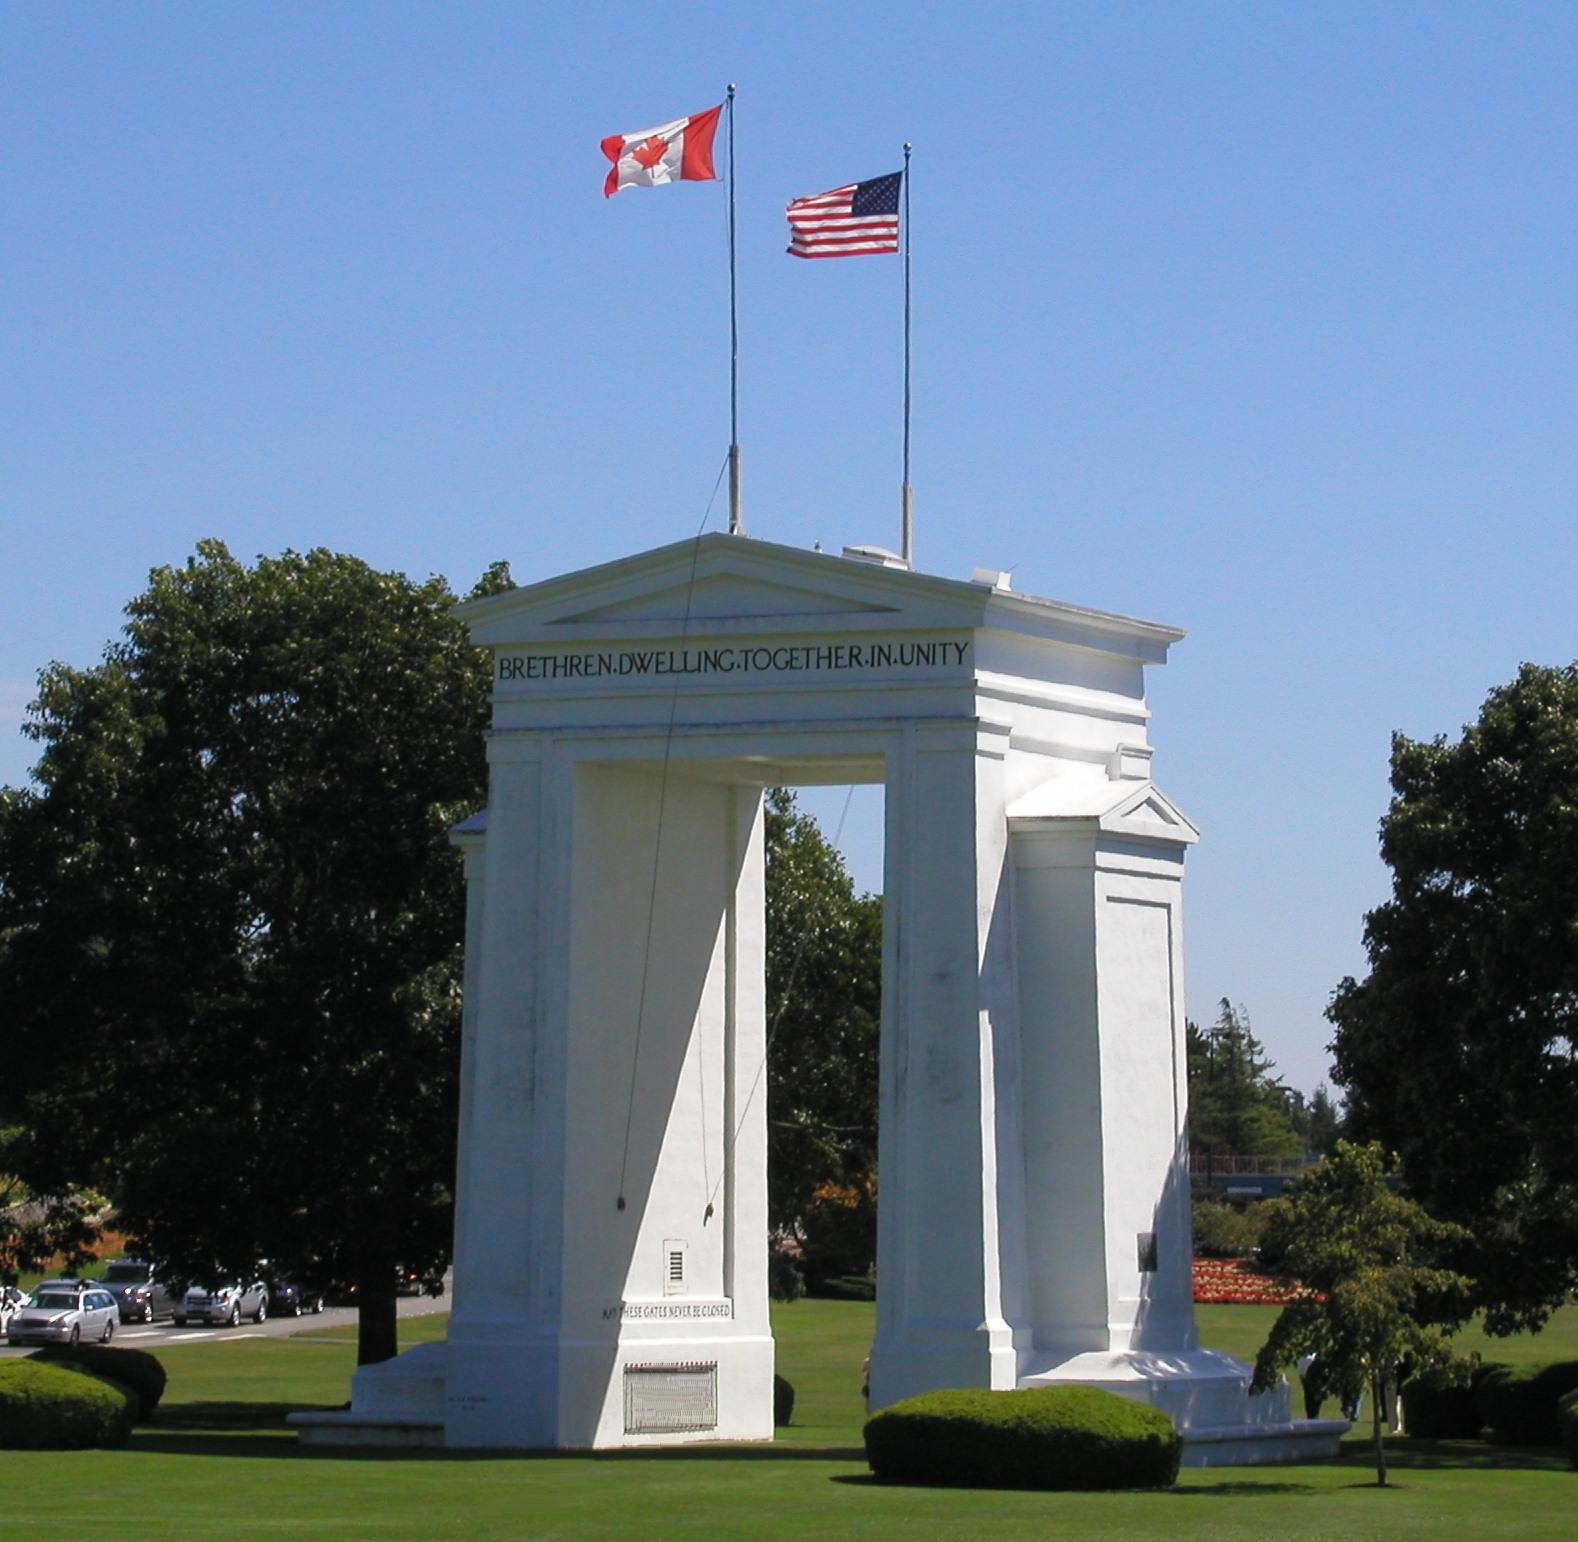 Map Show Border Canada Us Blaine Canada–United States border   Wikipedia